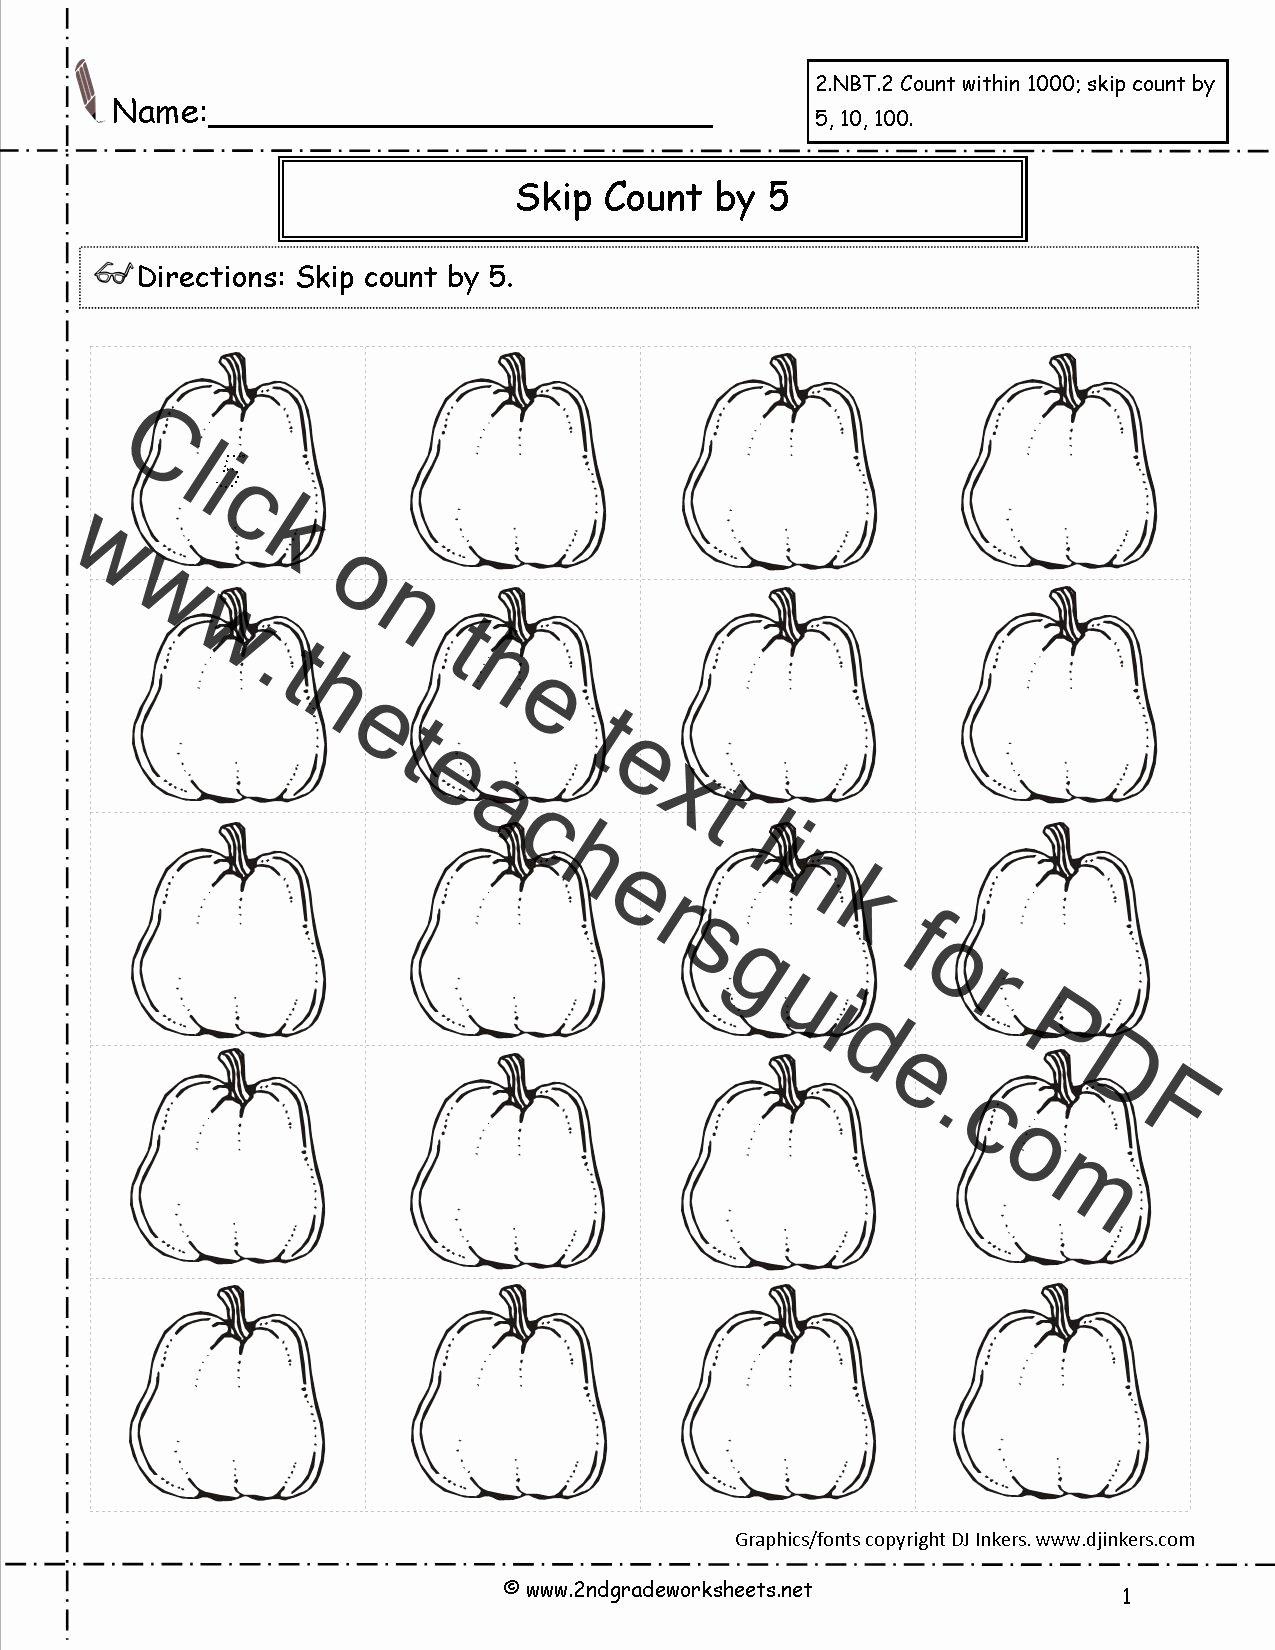 Pumpkin Math Worksheets for Preschoolers Unique Halloween Worksheets and Printouts